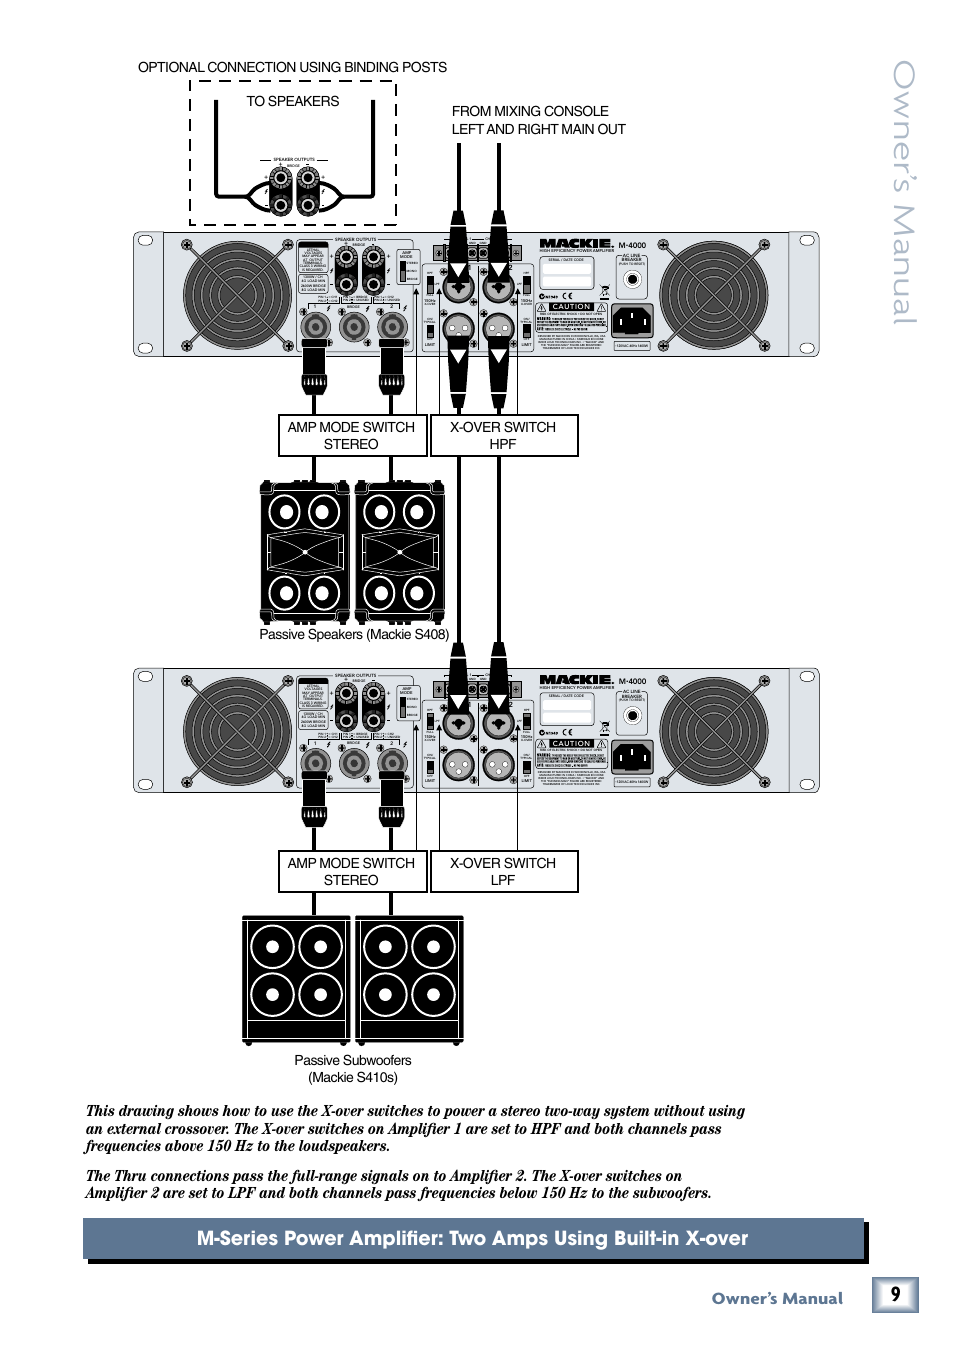 Owner S Manual Owners Mackie M3000 User Page 9 28 Wiring Diagrams